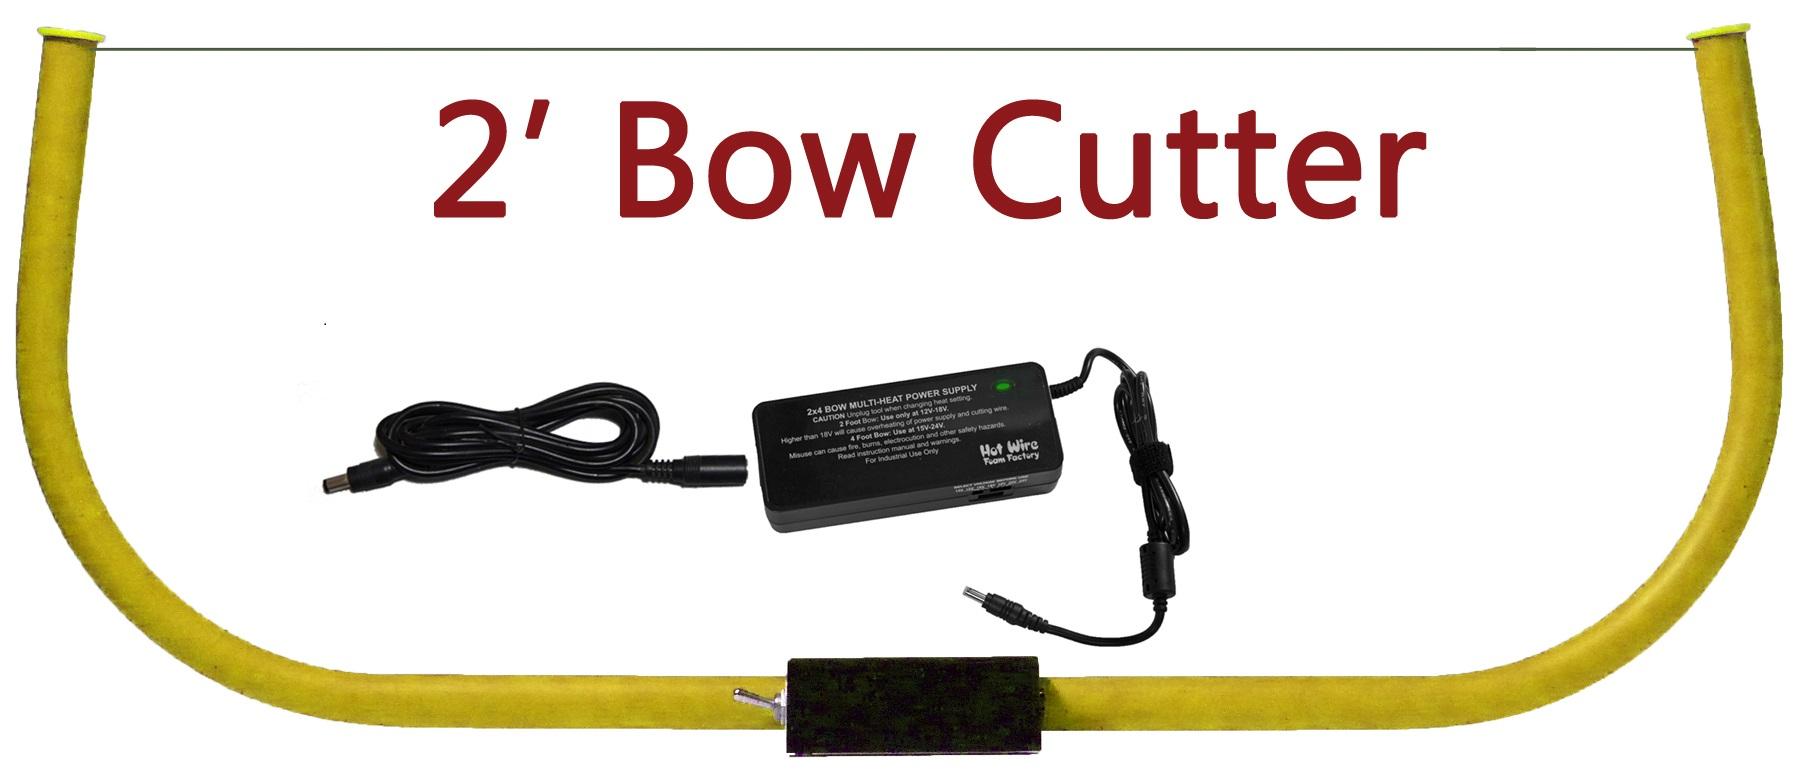 #051 - 2 Foot Bow Cutter